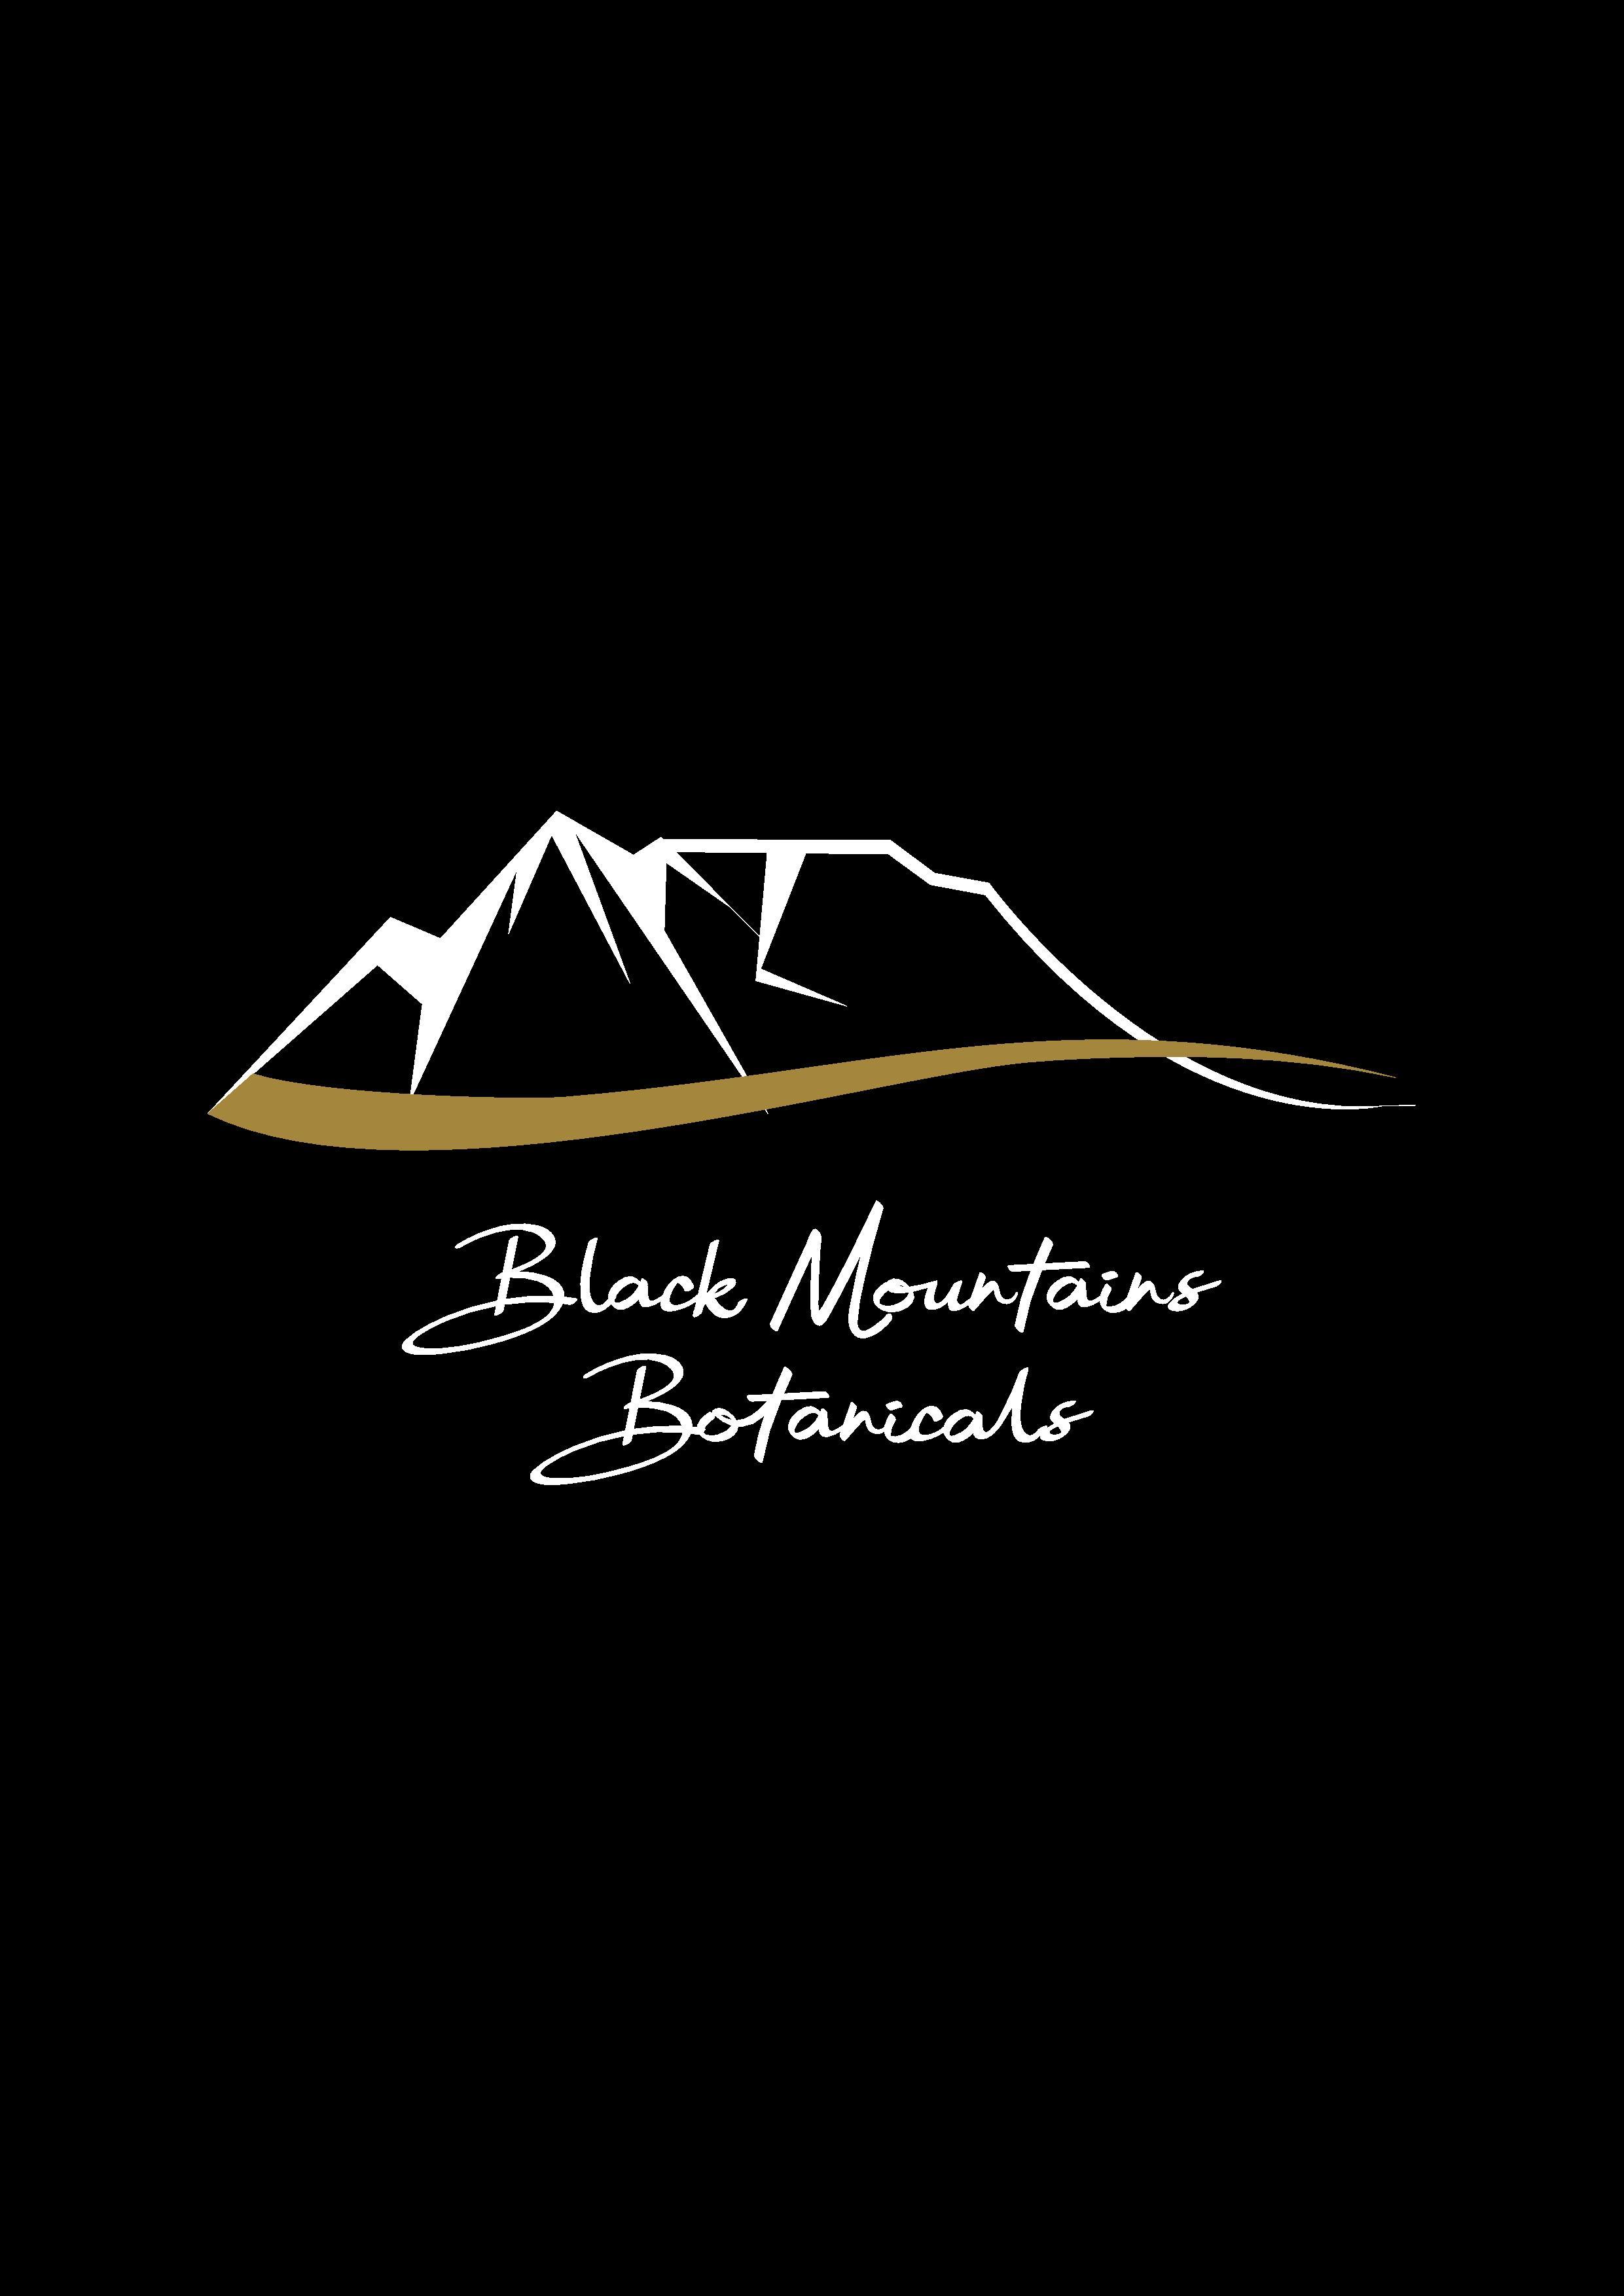 BLACK MOUNTAINS BOTANICALS LTD